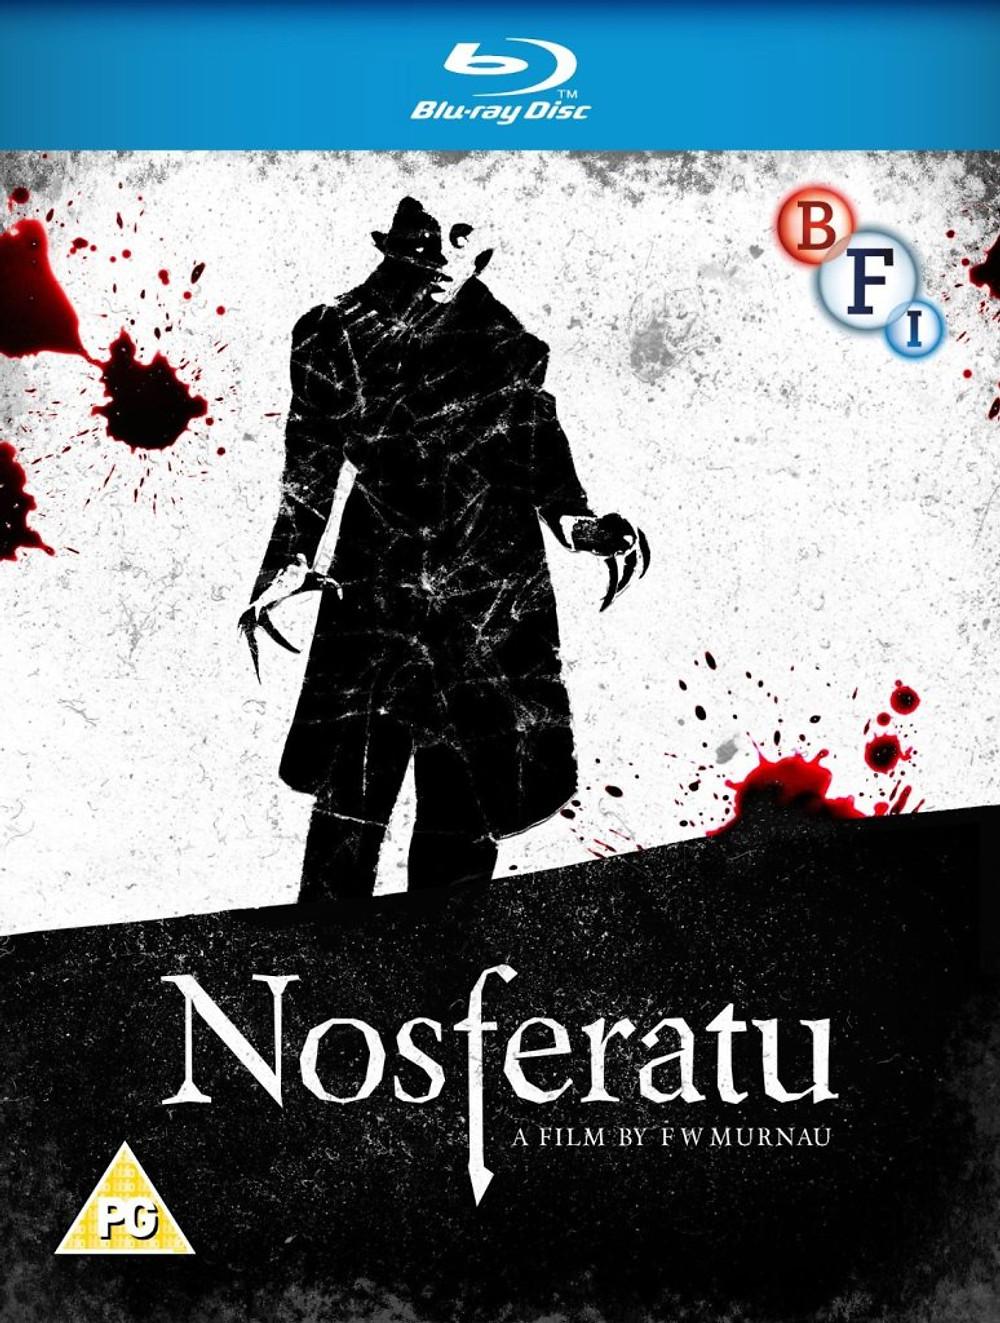 Nosferatu BFI Bluray Cover